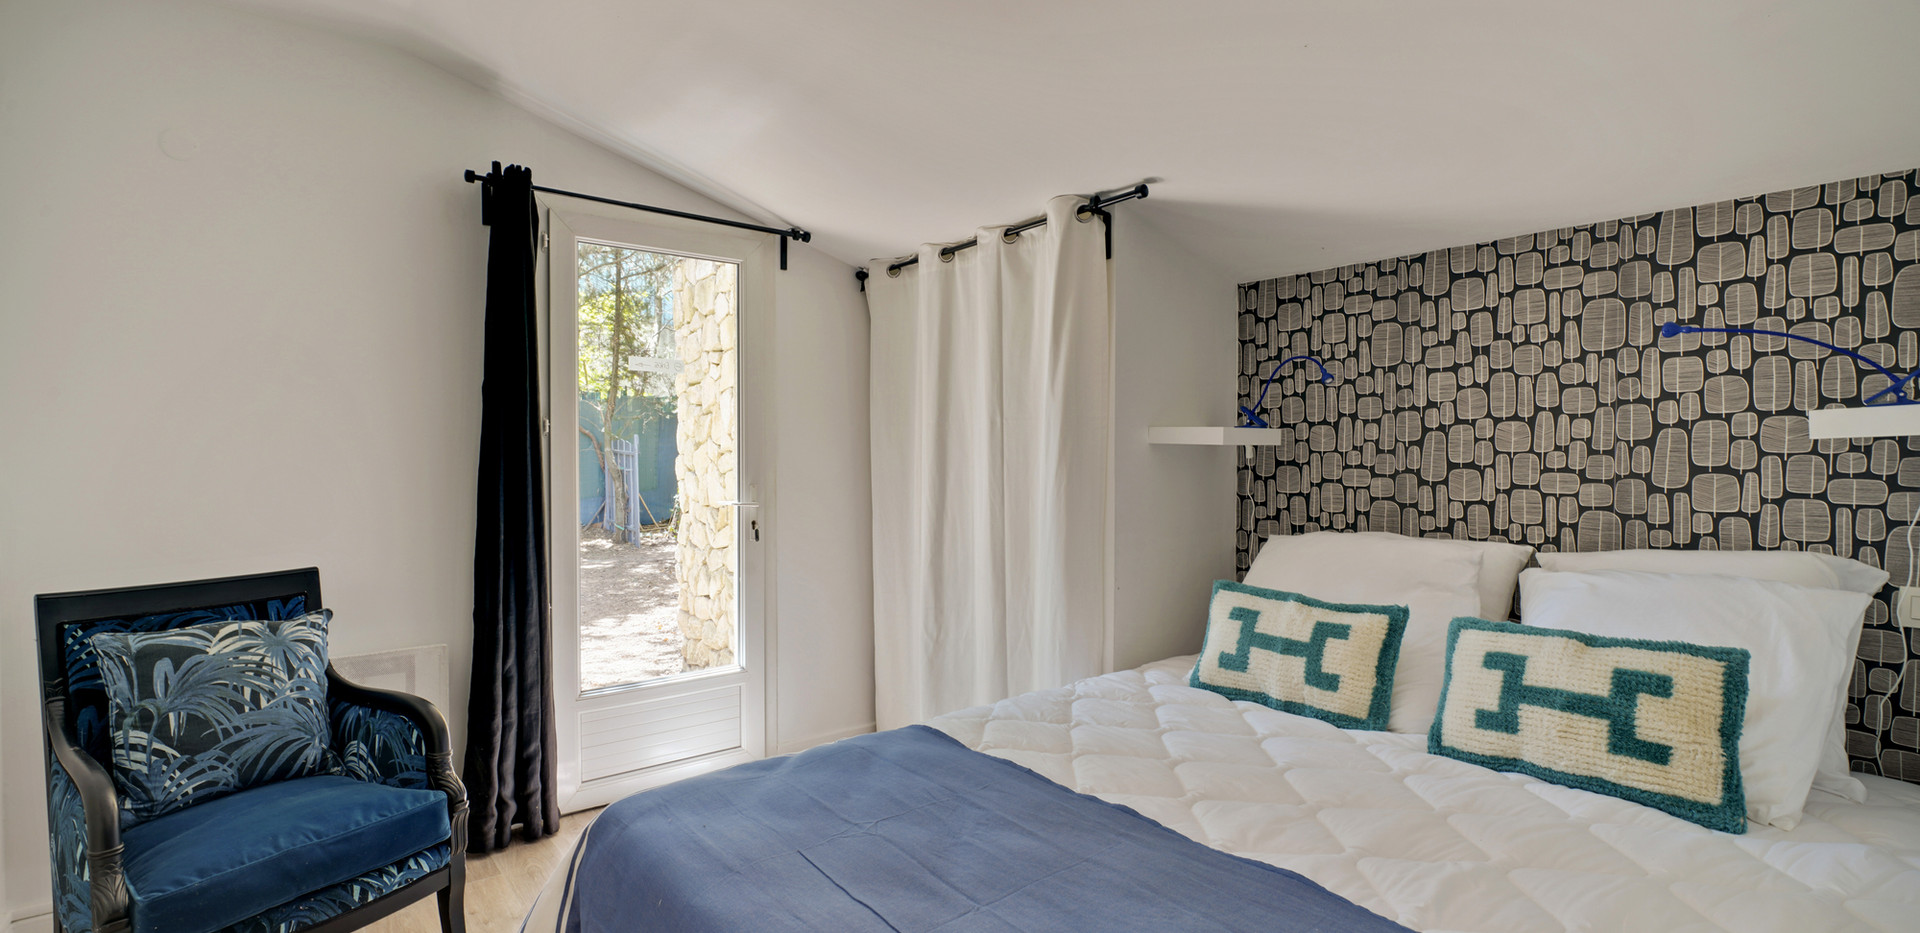 Maison des Amis, Mas Saint-Gens, holiday rental